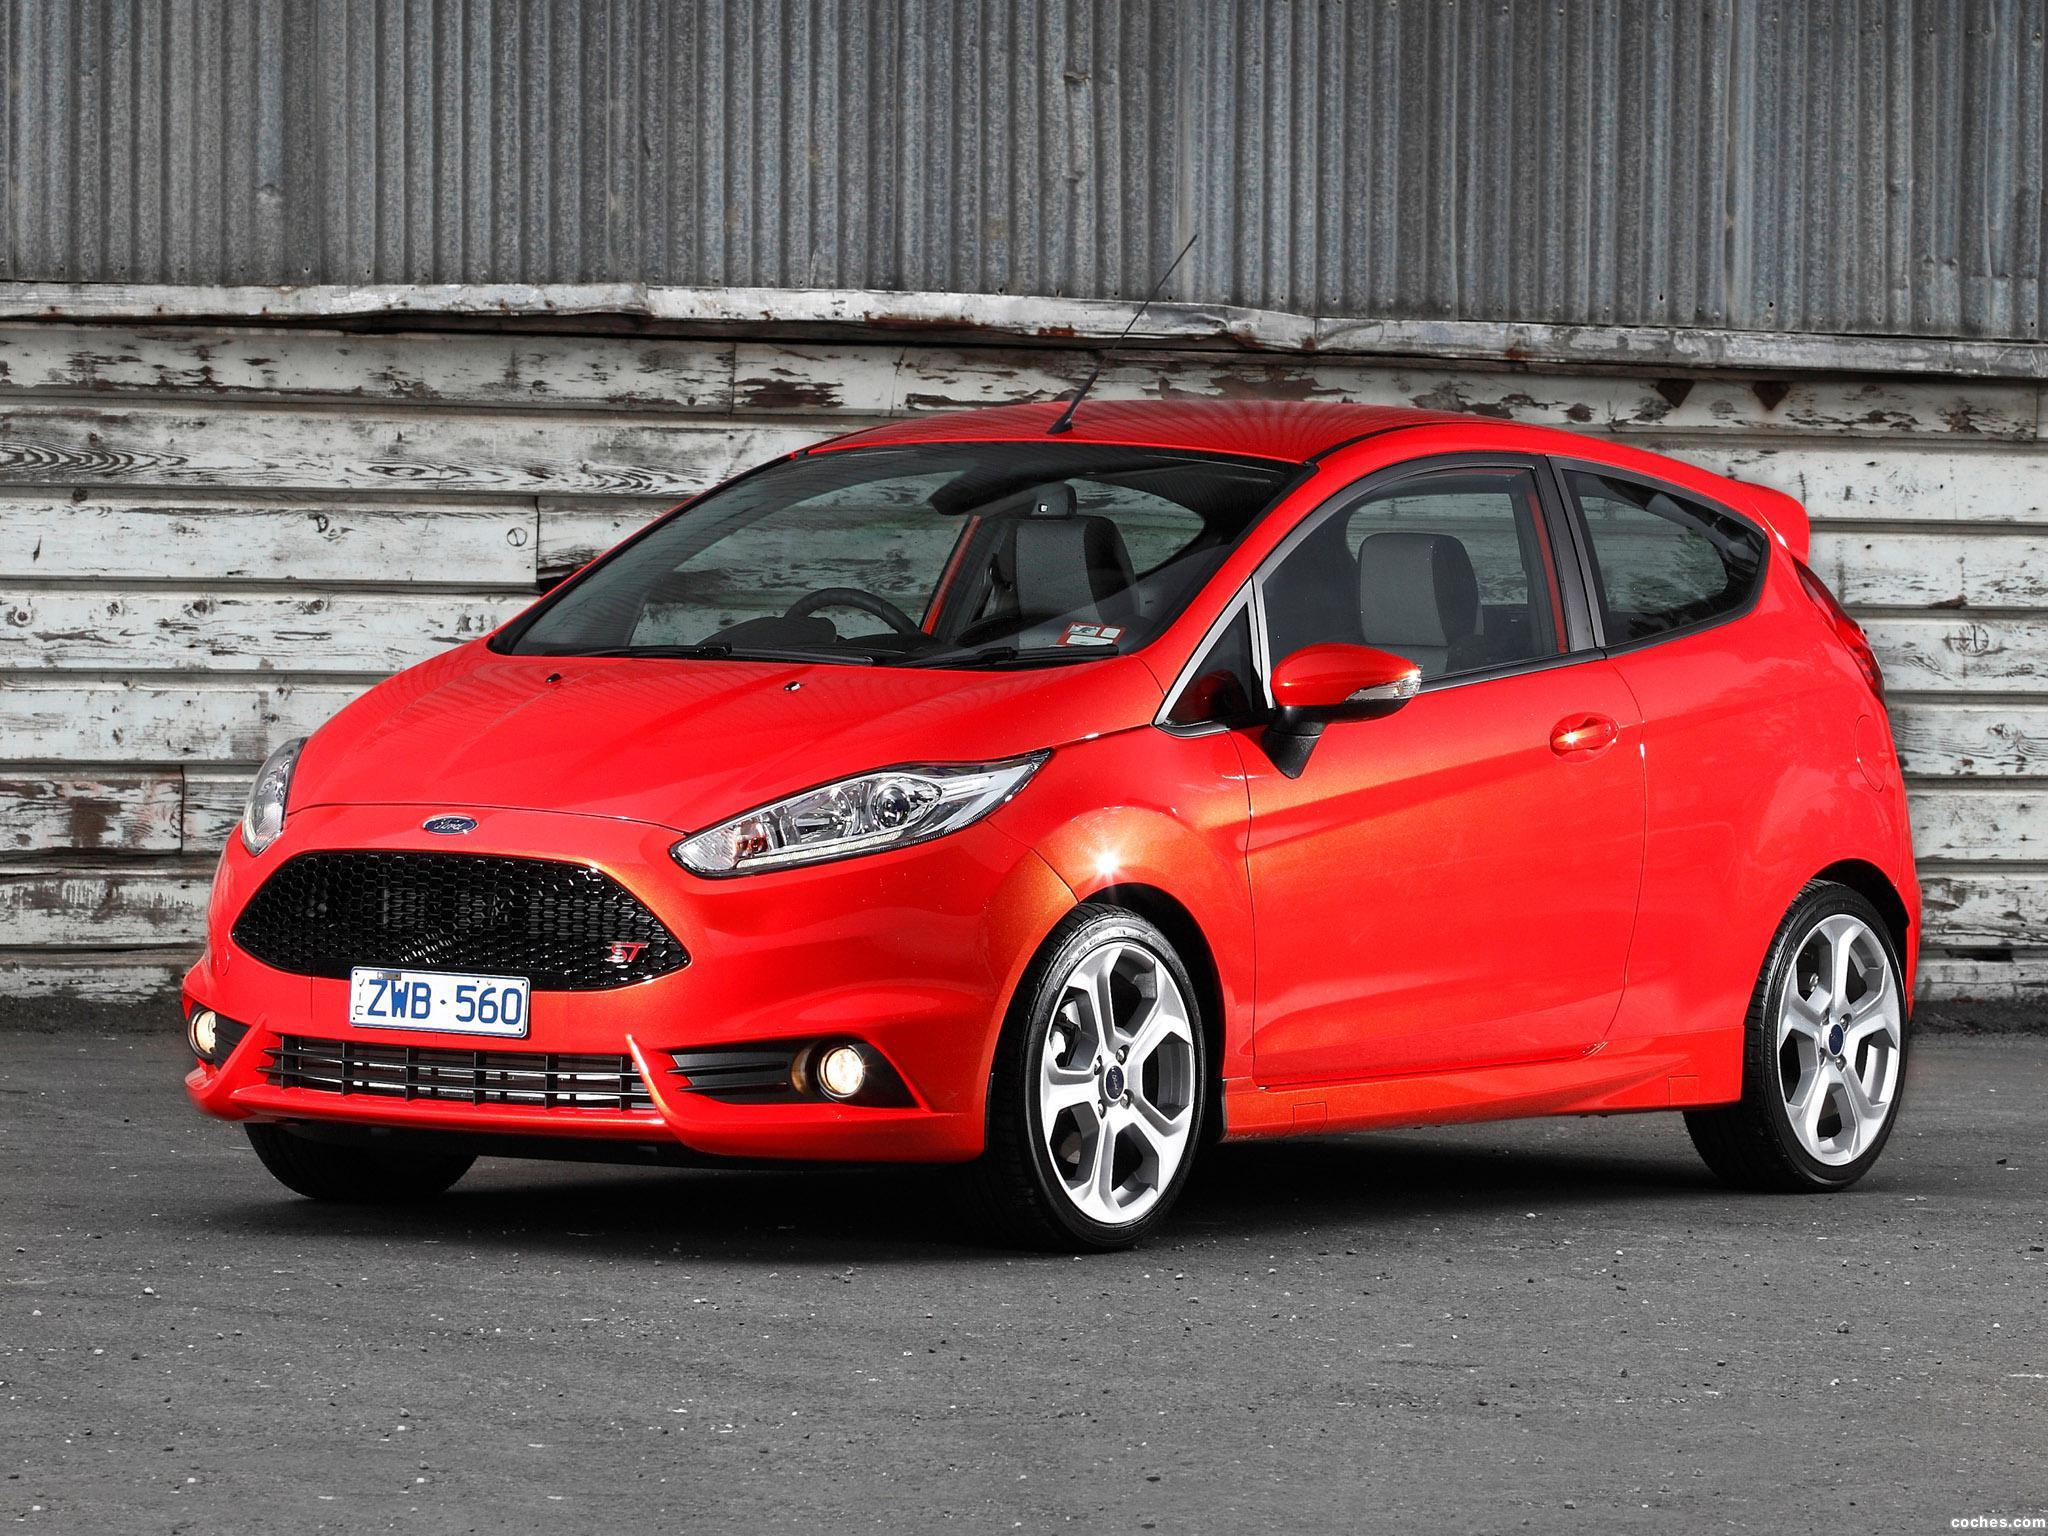 Foto 6 de Ford Fiesta ST 3 puertas Australia 2013